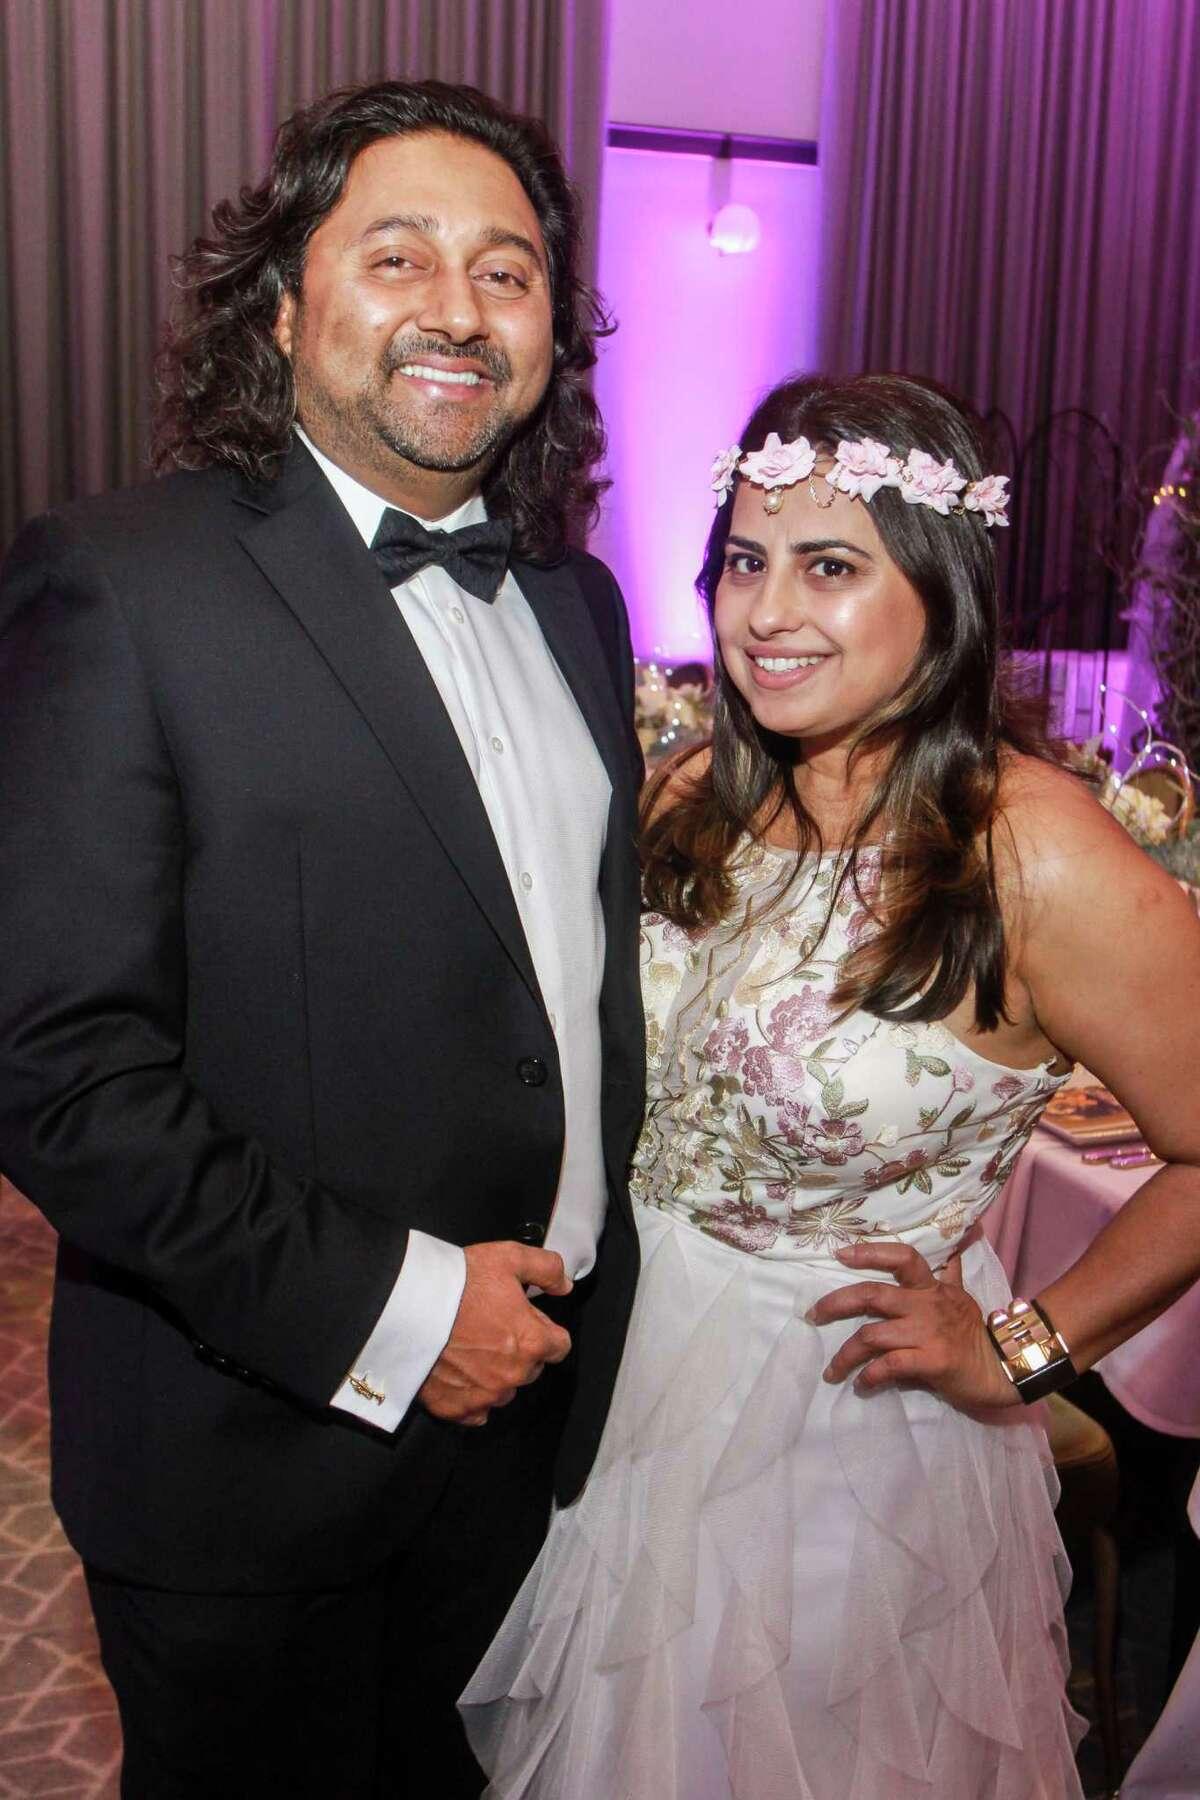 Sterling Ablack and Ruchi Mukerjee at the Ars Lyrica gala.